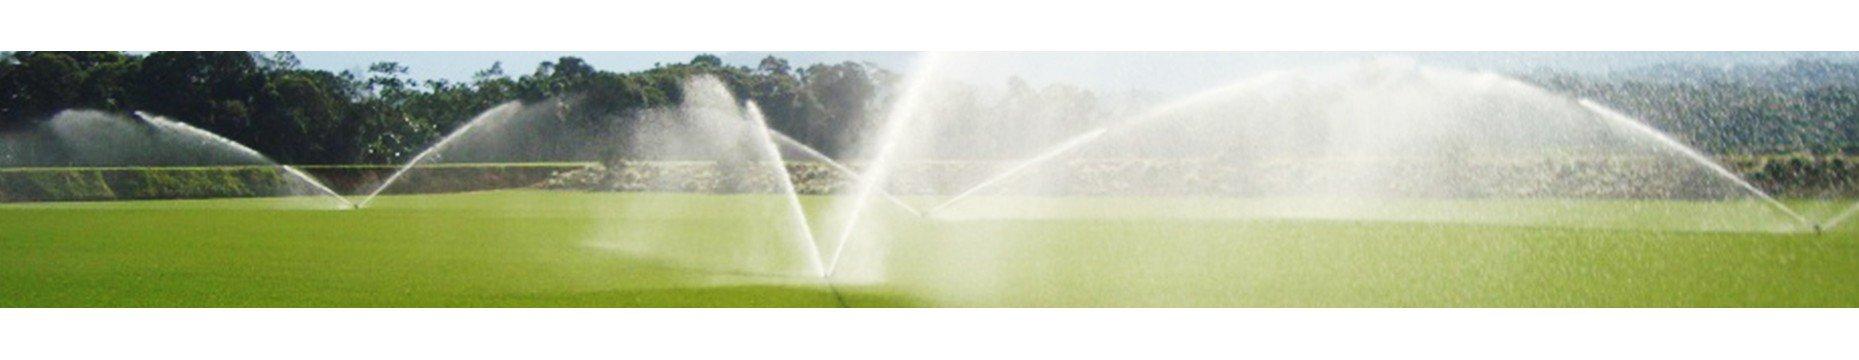 irrigacao grama